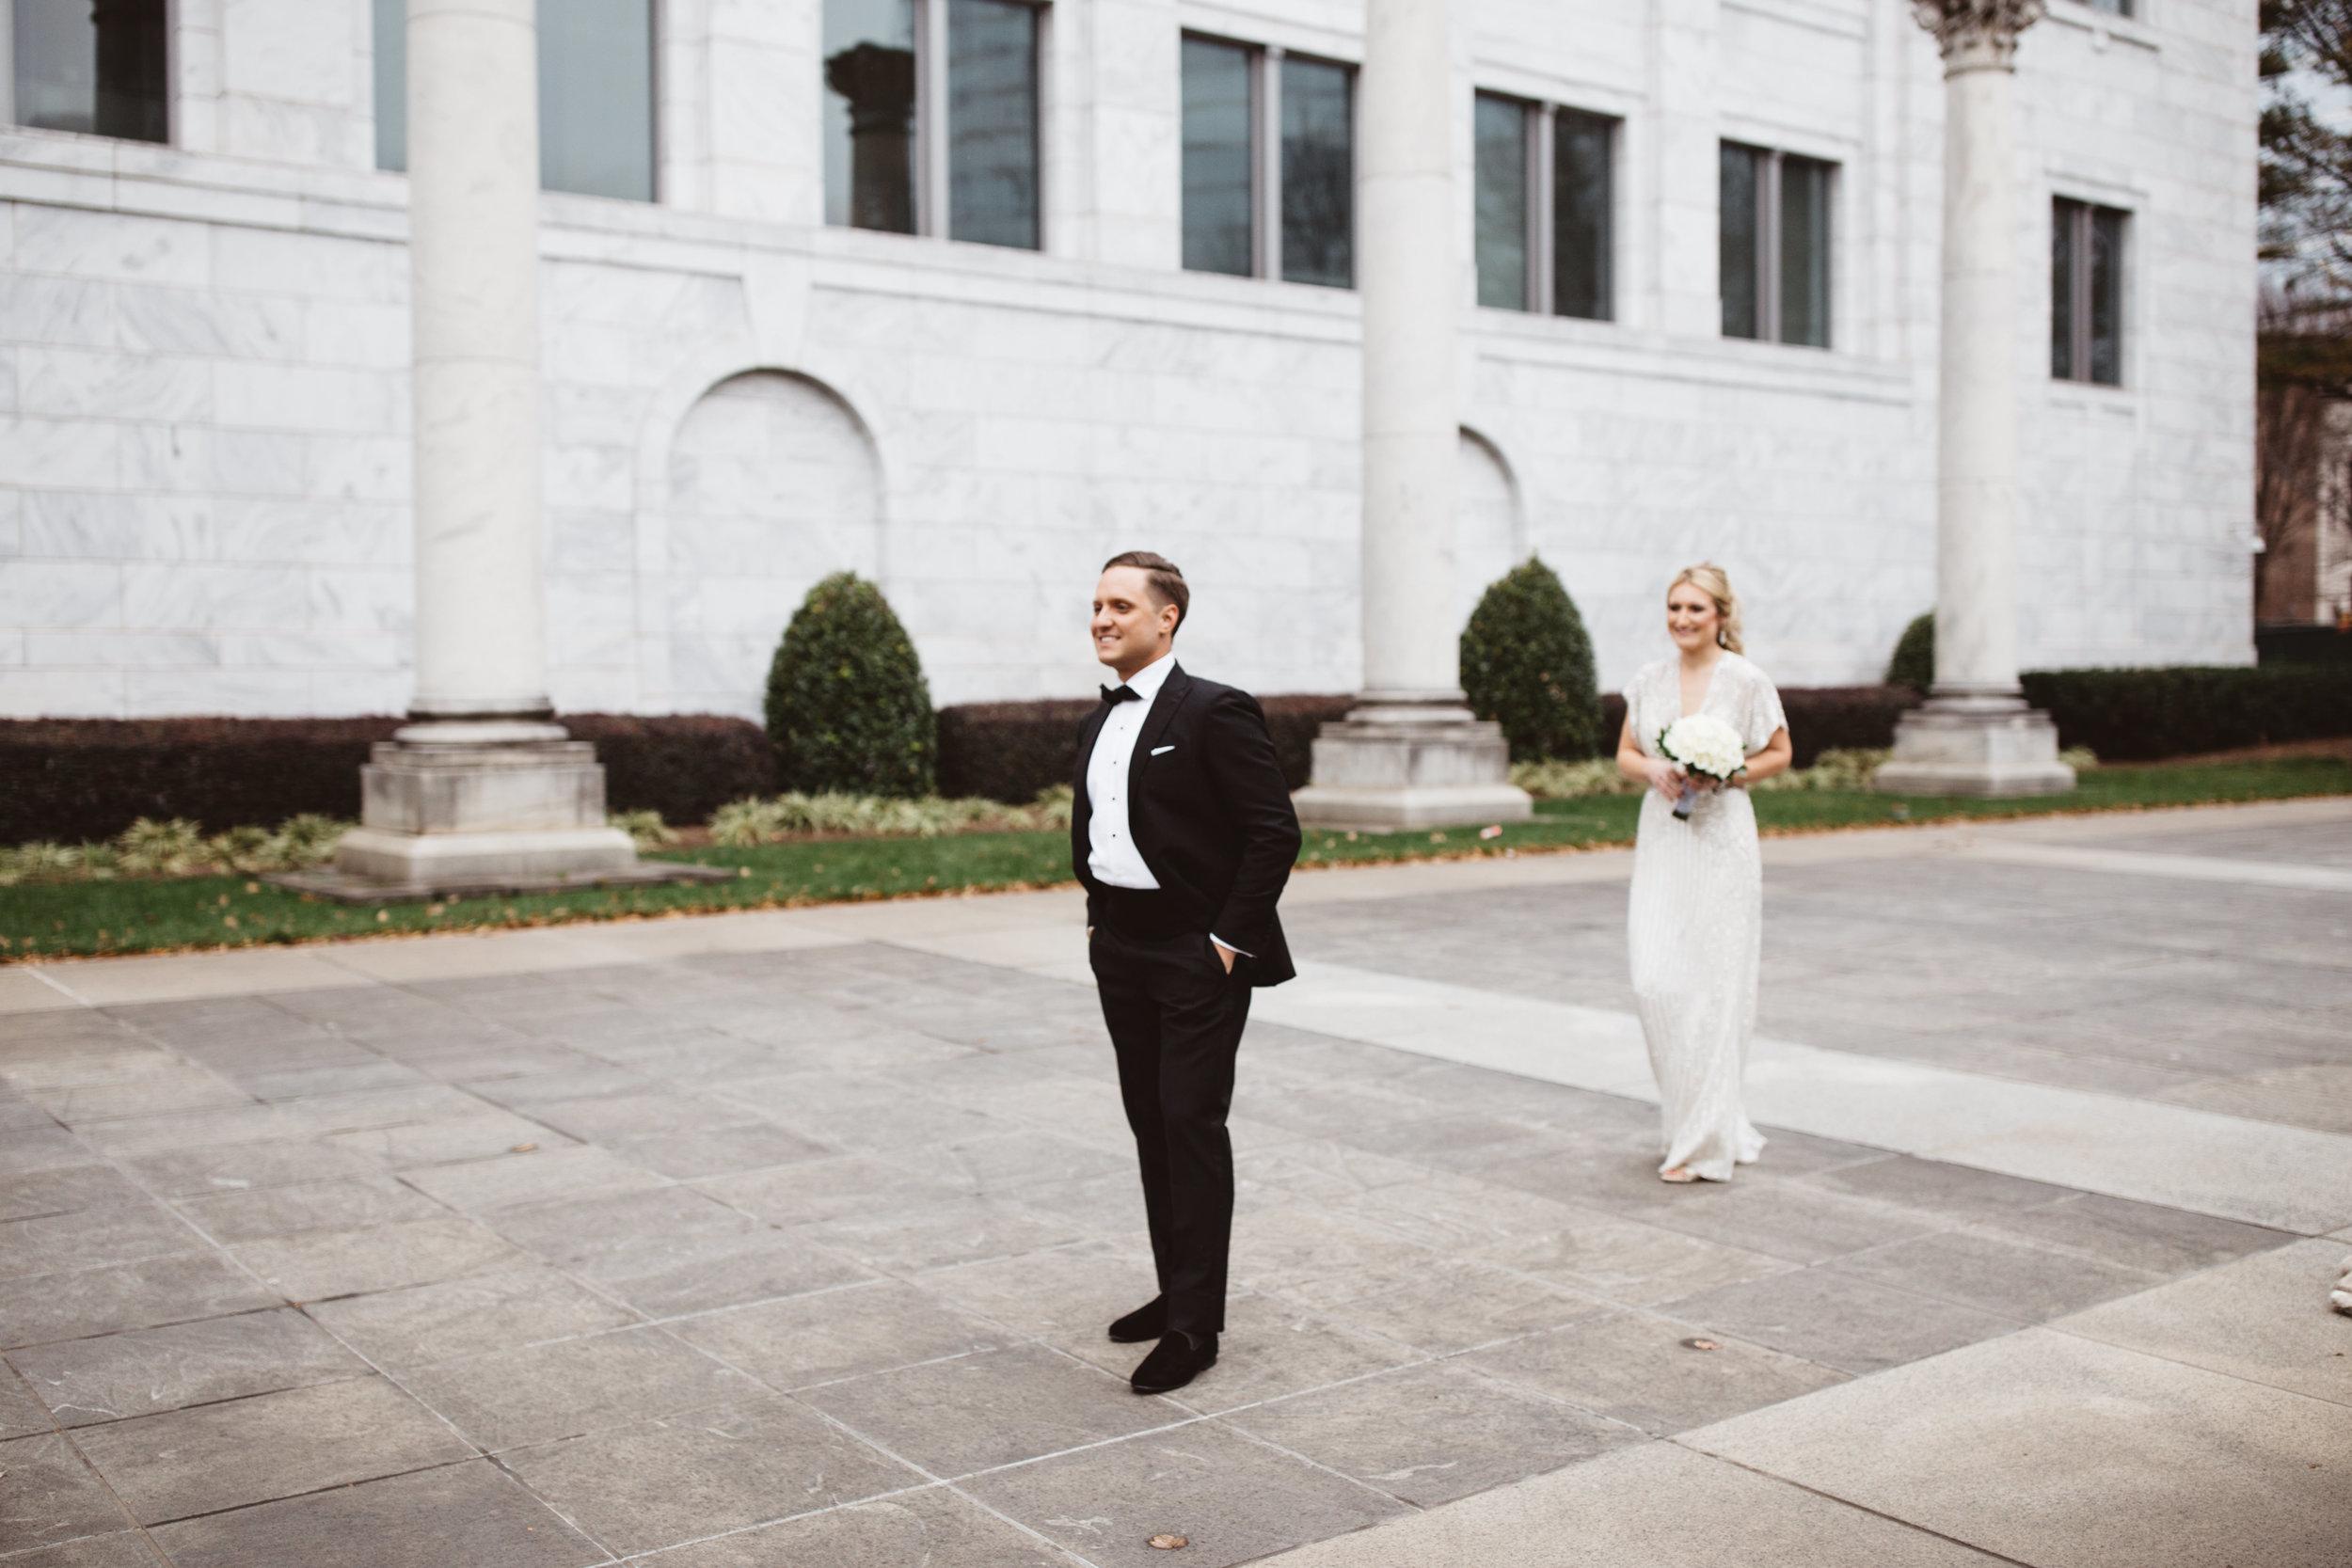 Mattie Bell Photography- Kelly & Zack Wedding Atlanta Brewery -96.jpg